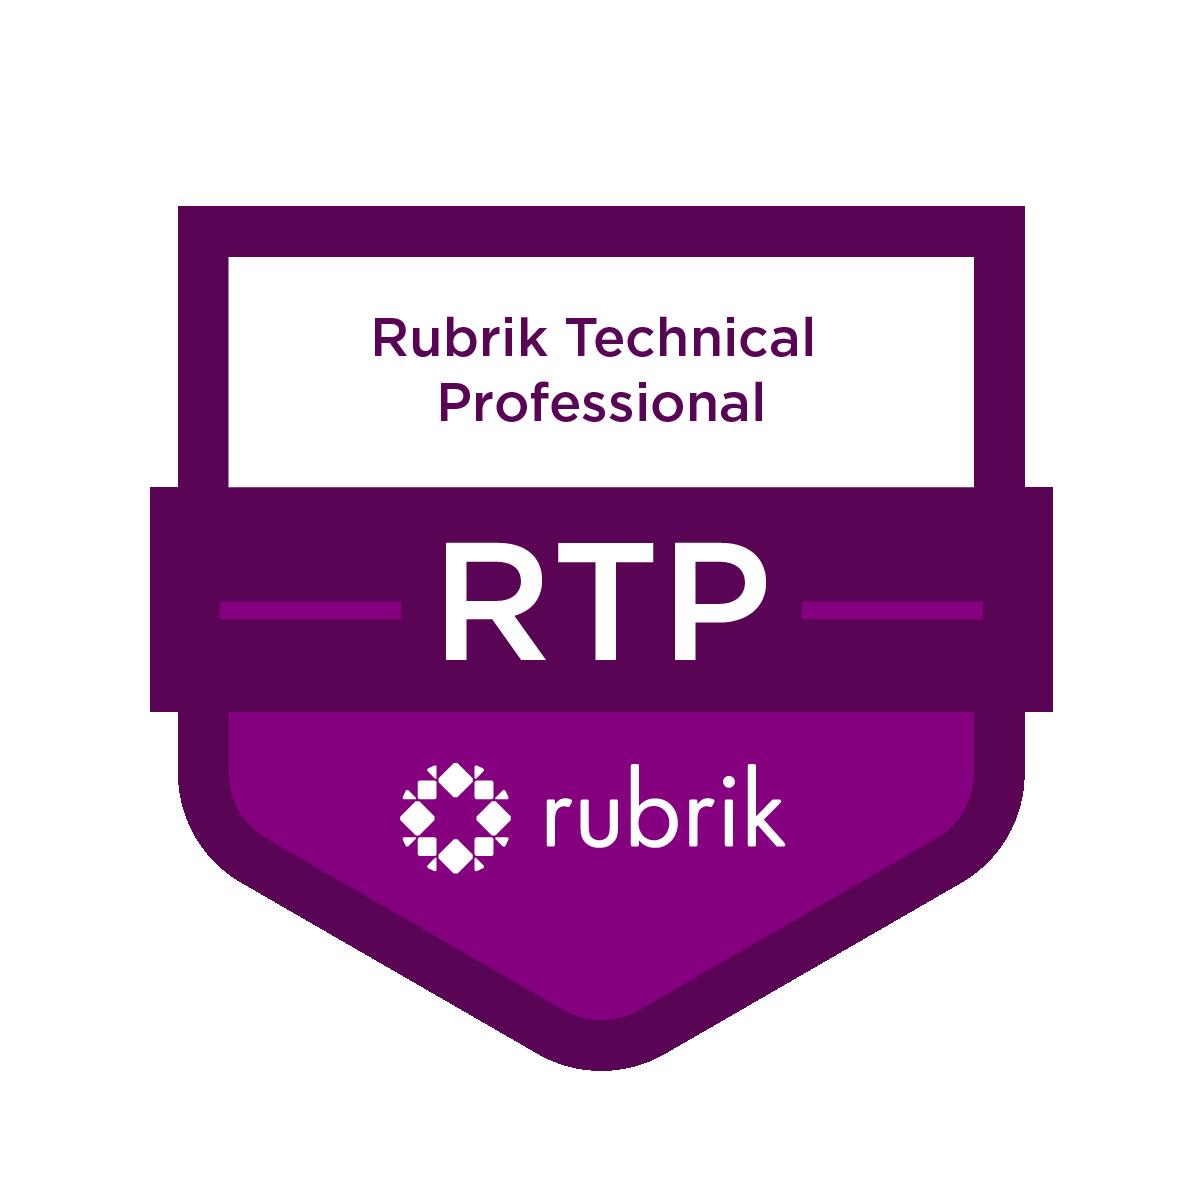 RTP - Rubrik Technical Professional